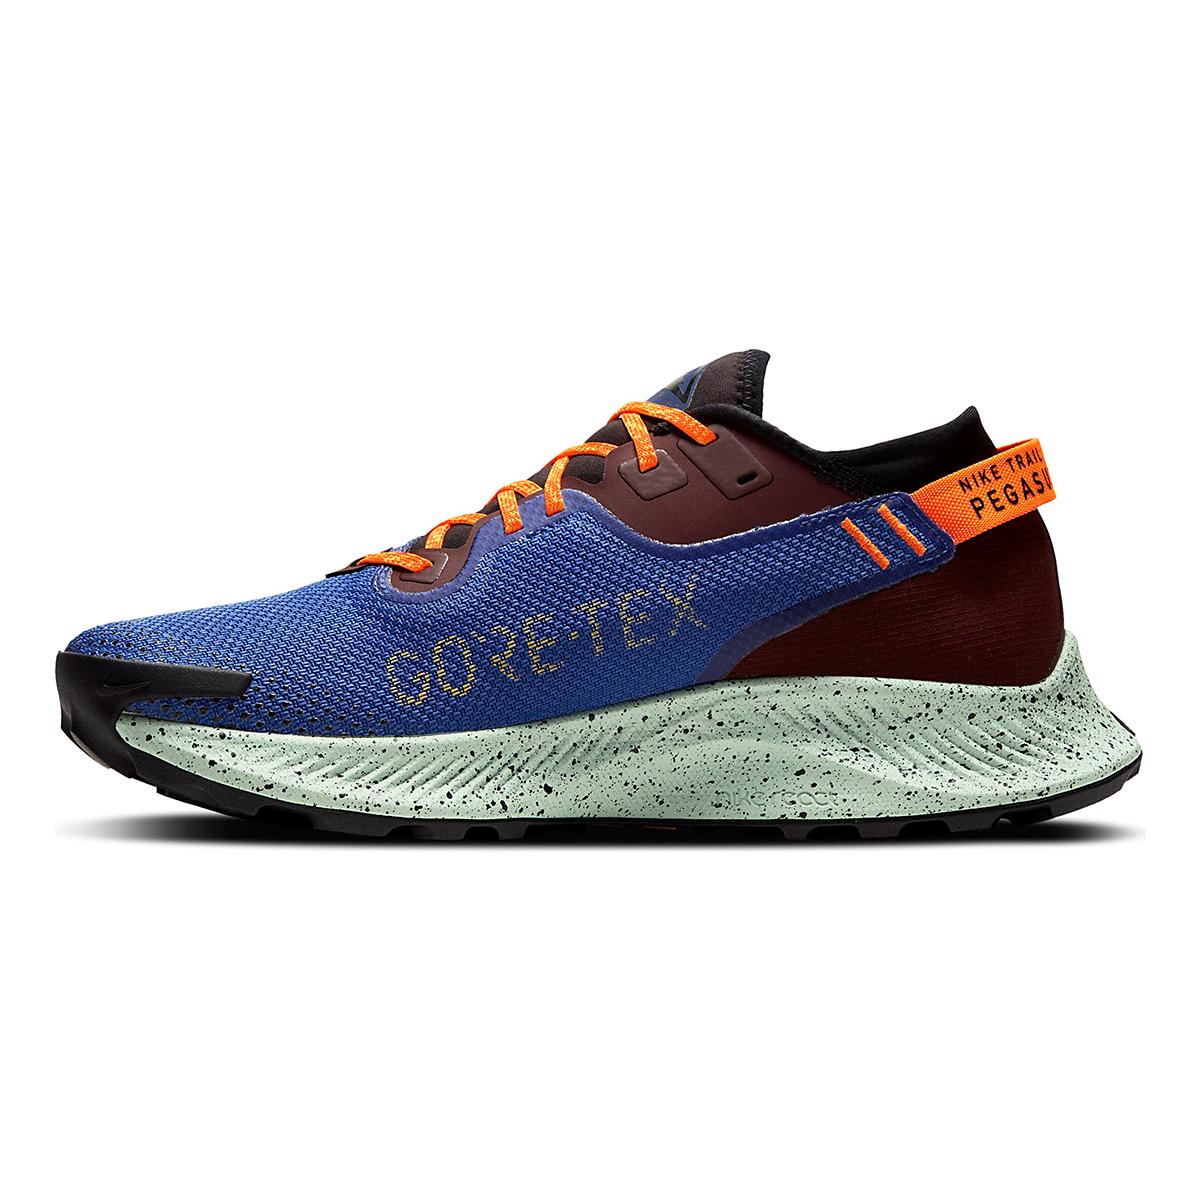 Men's Nike Pegasus Trail 2 Gore-Tex Running Shoe - Color: Mystic Dates/Laser Orange/ Astronomy Blue - Size: 6 - Width: Regular, Mystic Dates/Laser Orange/ Astronomy Blue, large, image 2